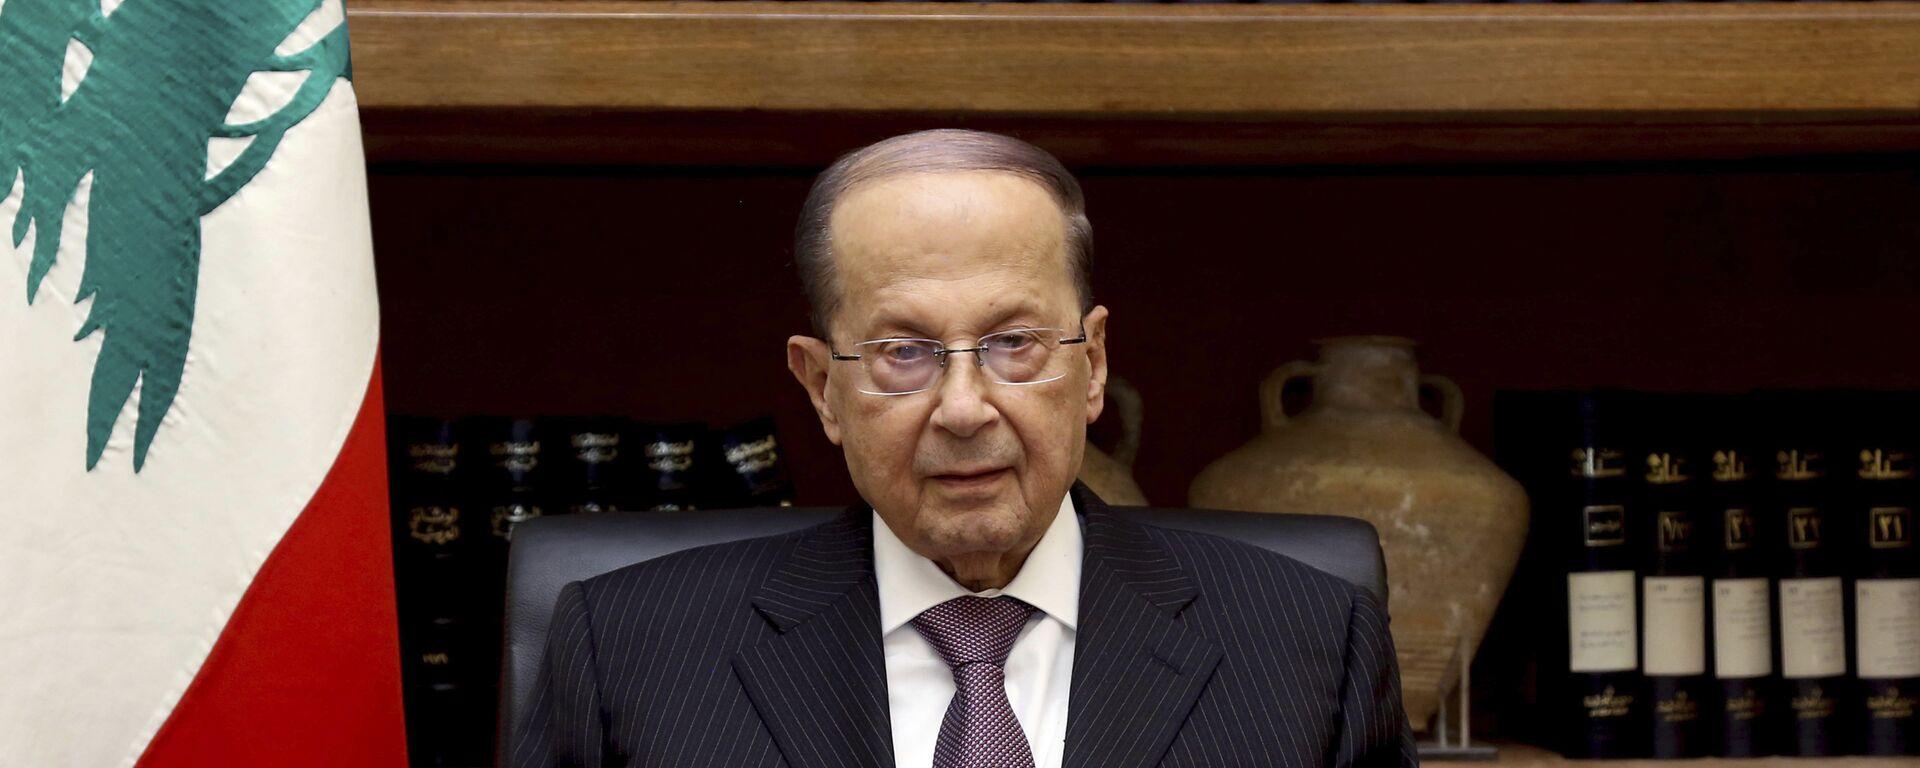 El presidente del Líbano, Michel Aoun - Sputnik Mundo, 1920, 26.07.2021